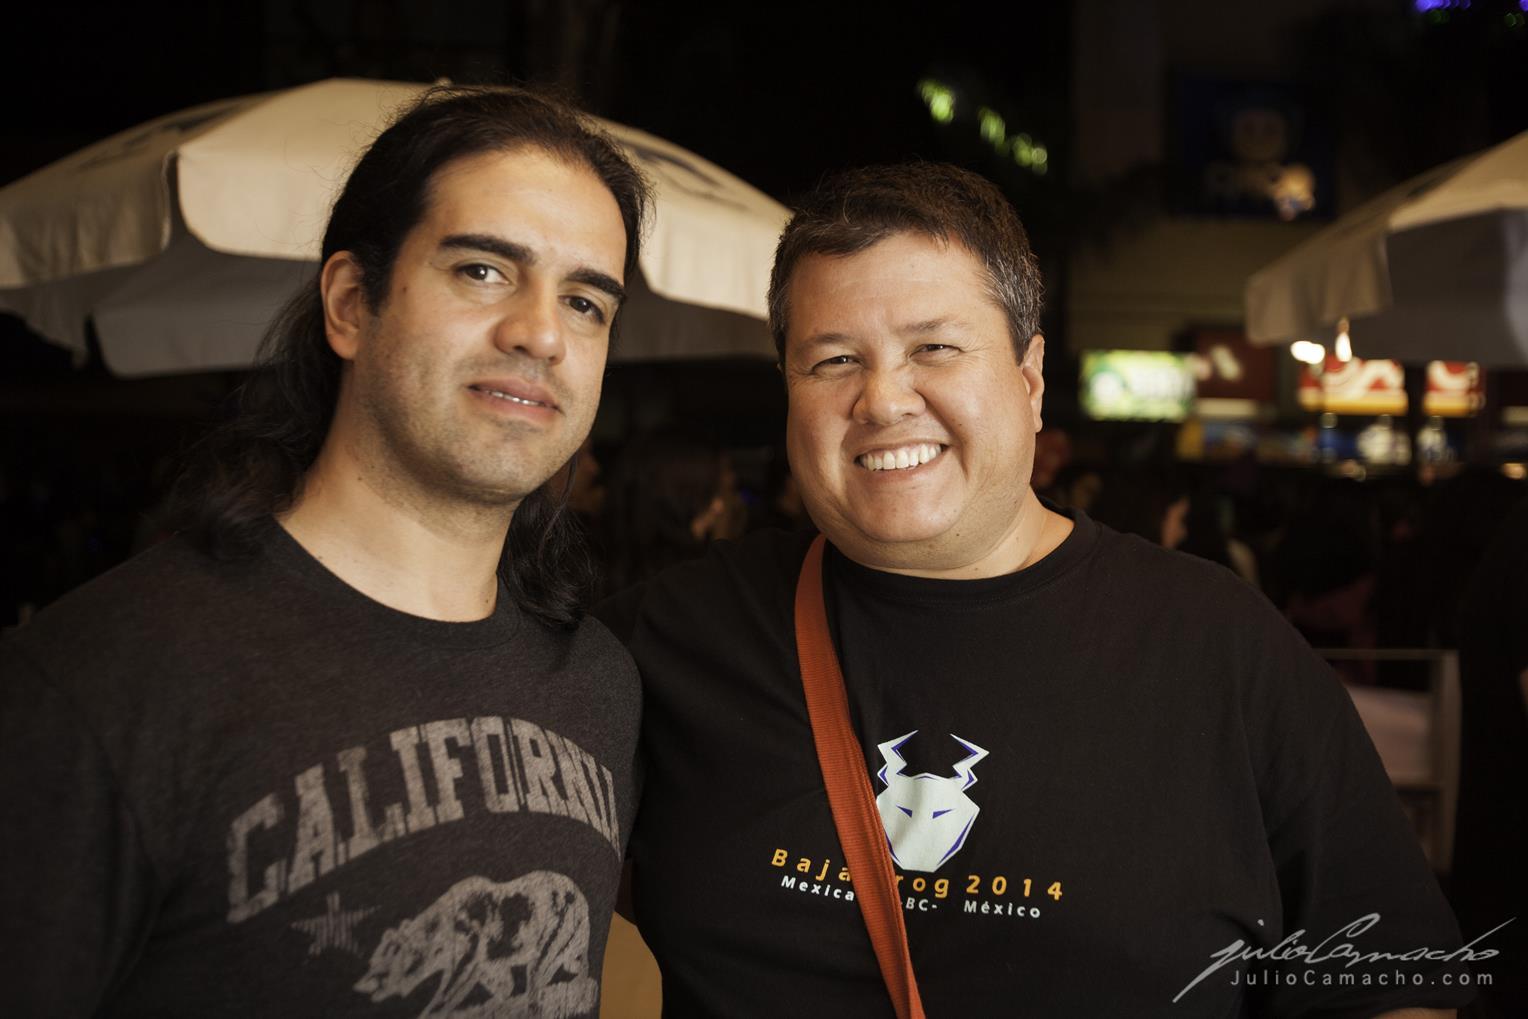 2014-10-30 31 CAST TOUR Ensenada y Tijuana - 1875 - www.Juli (Copy).jpg